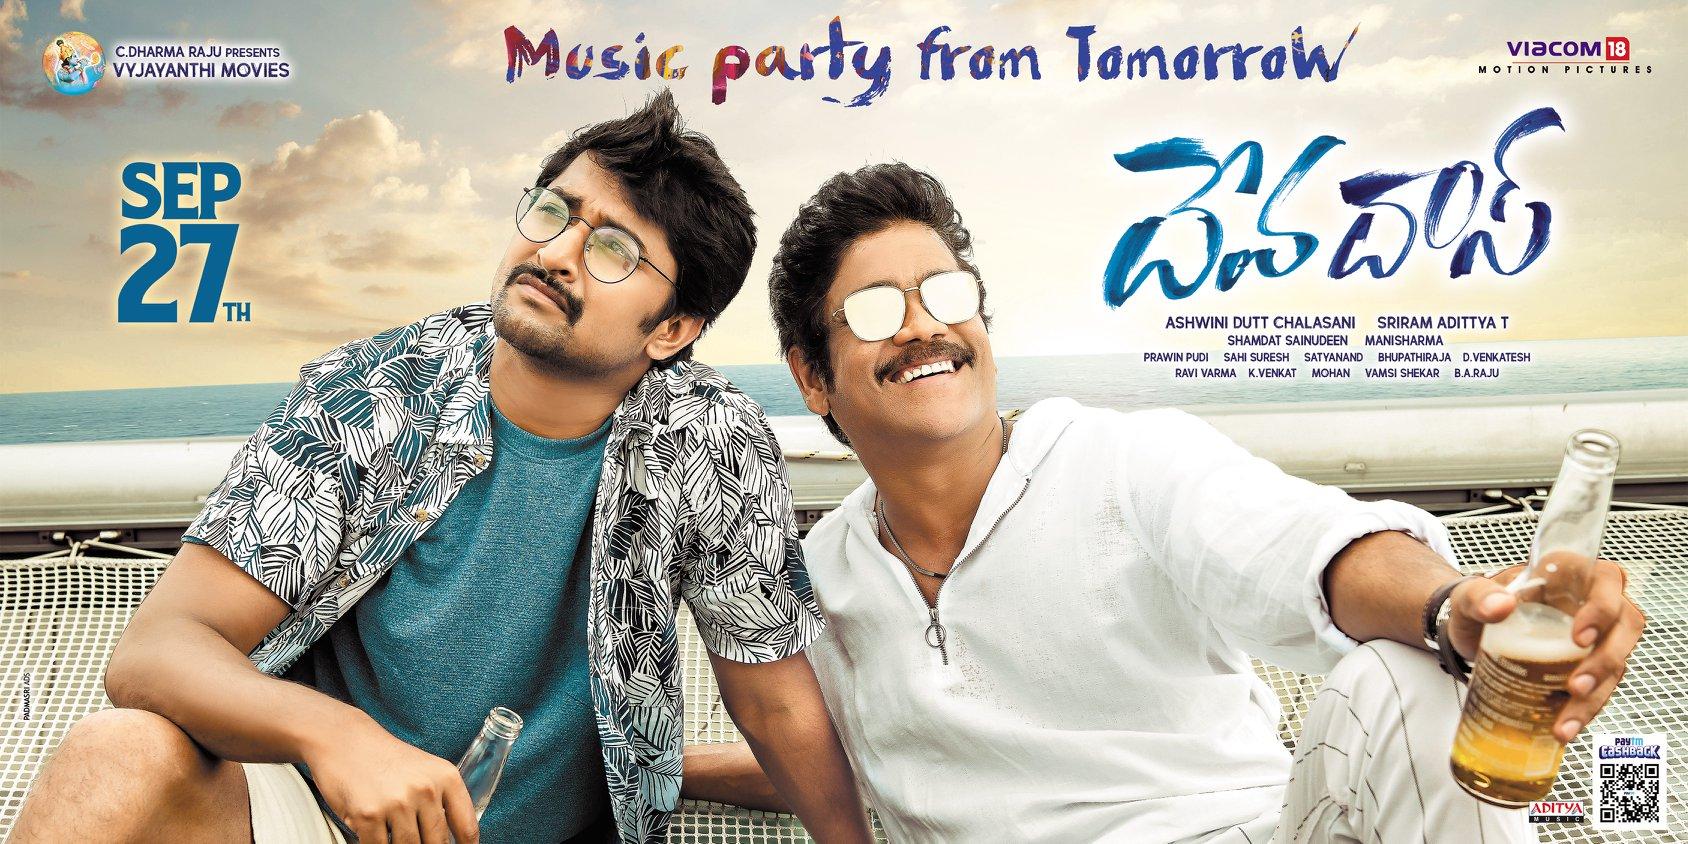 Nani Nagarjuna Devadas Music Party from Tomorrow Poster